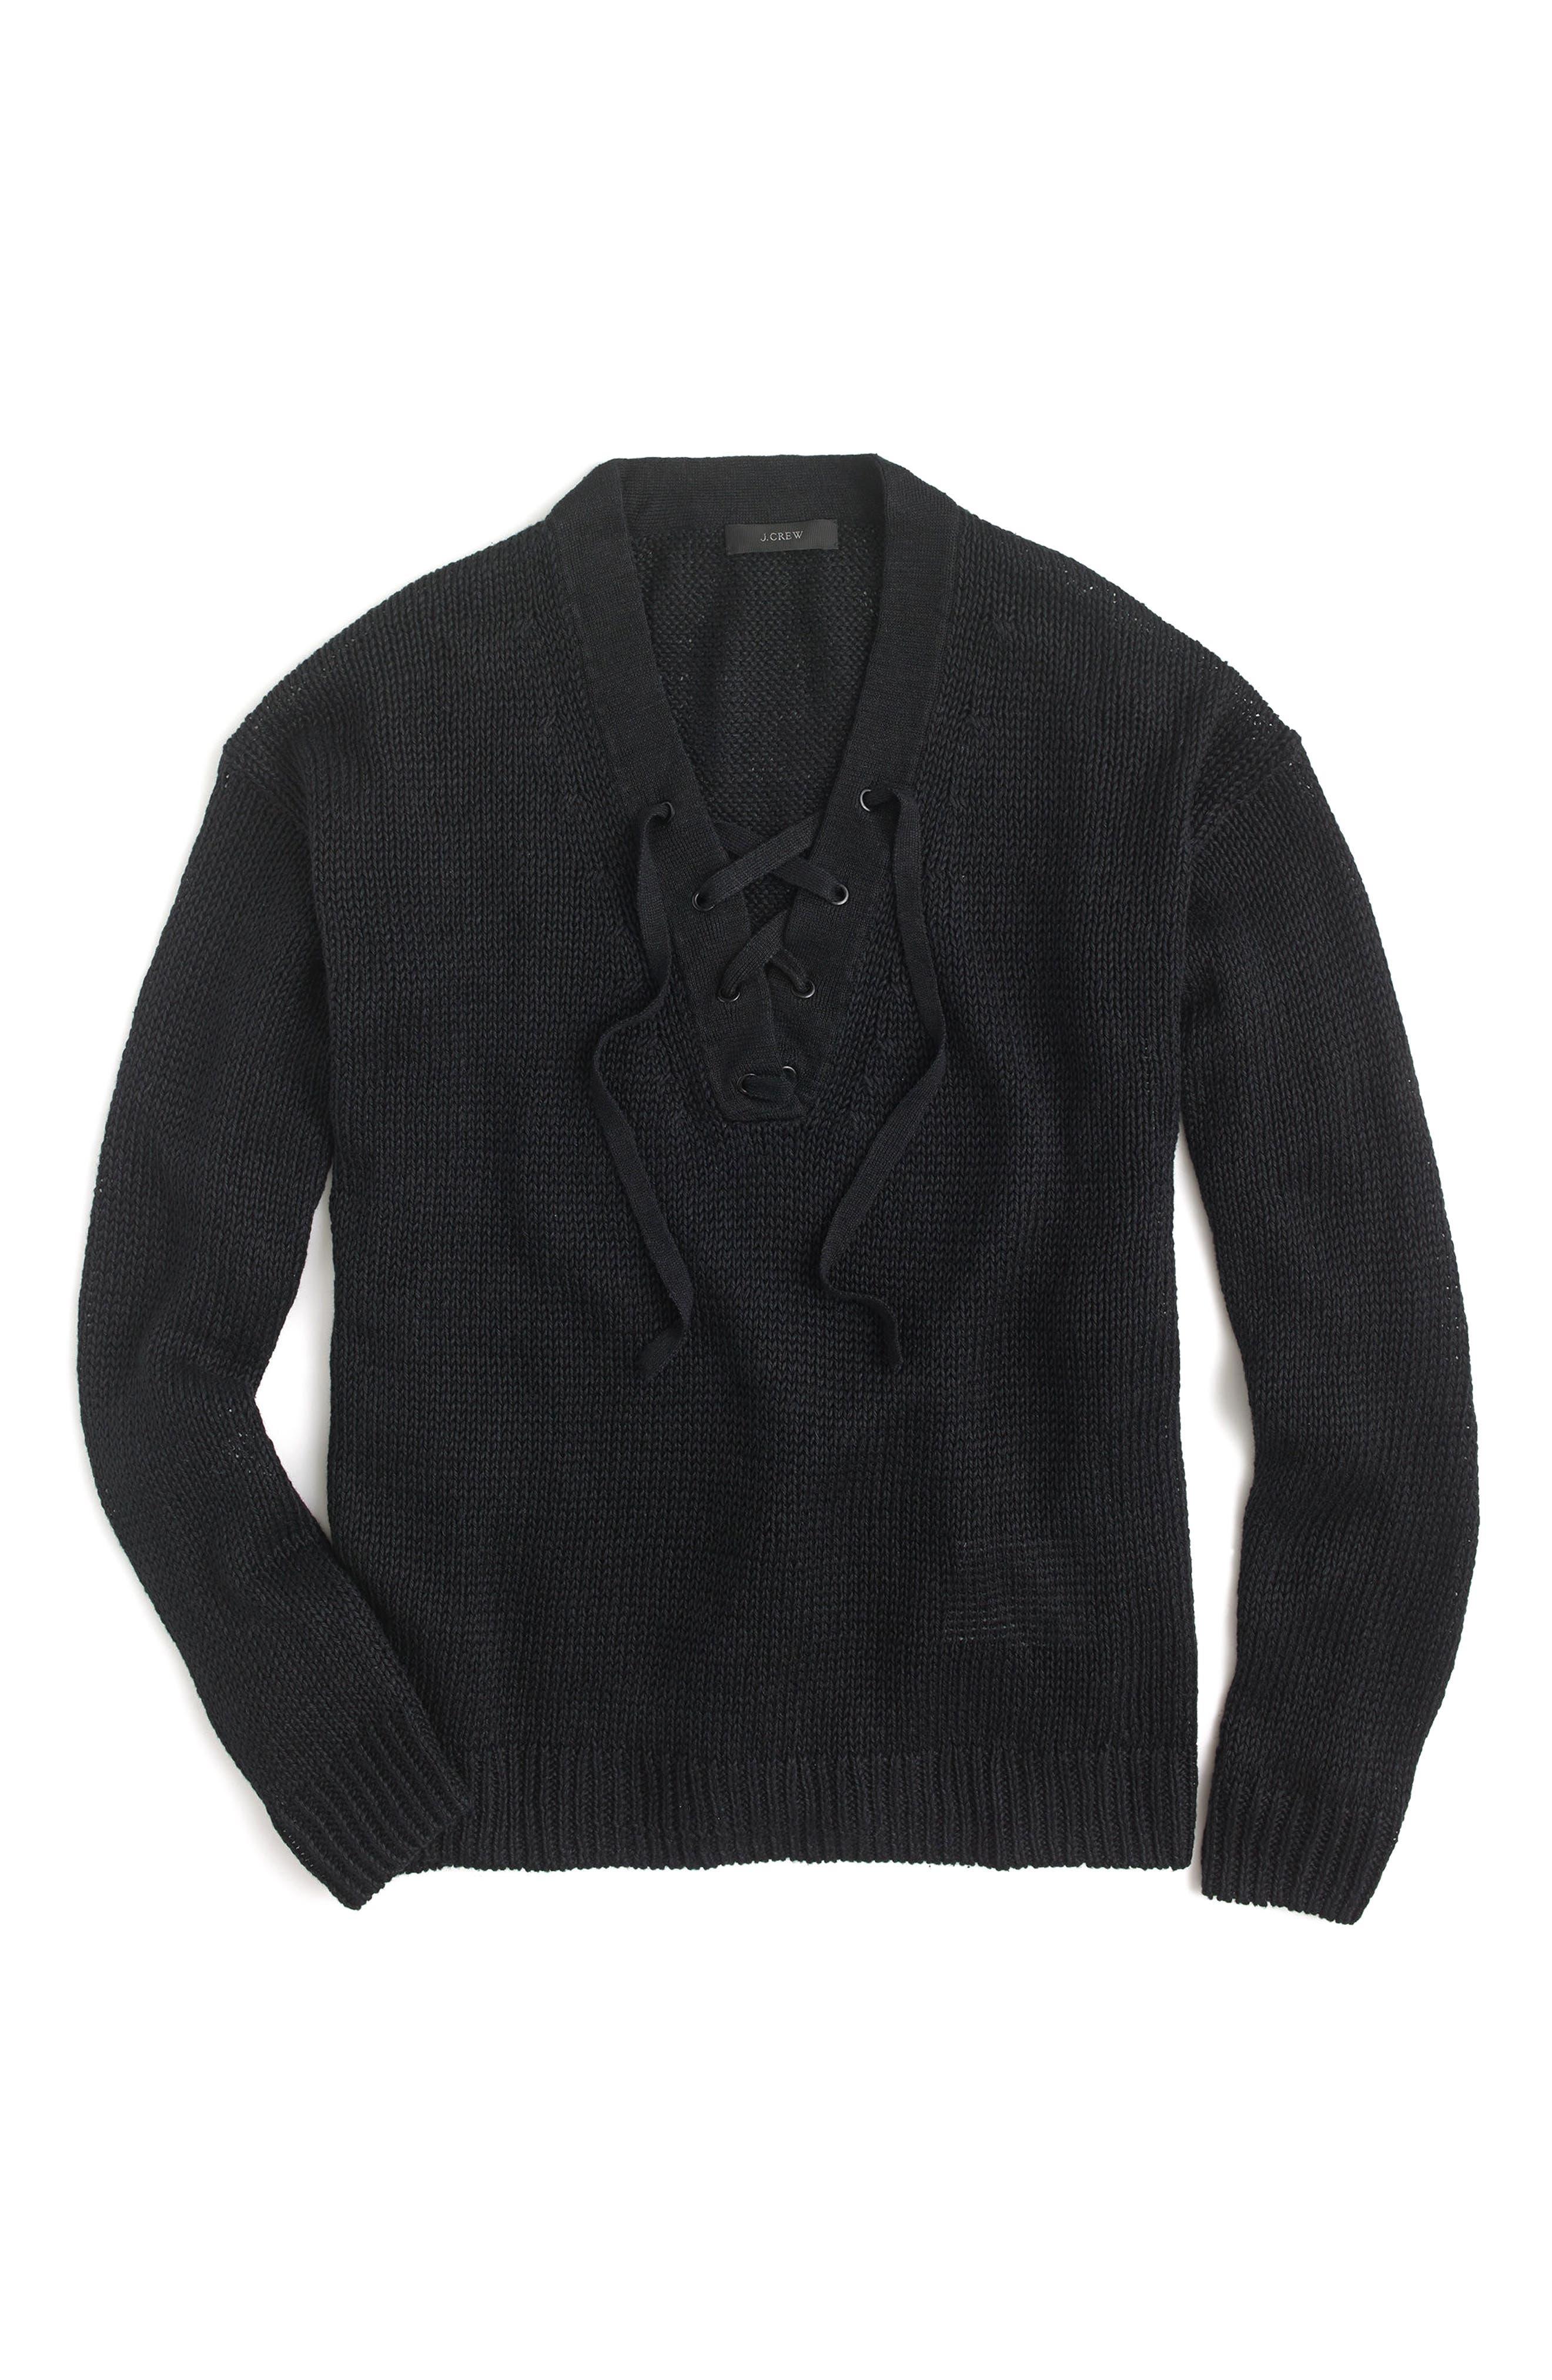 J. CREW J.Crew Linen Lace-Up Beach Sweater